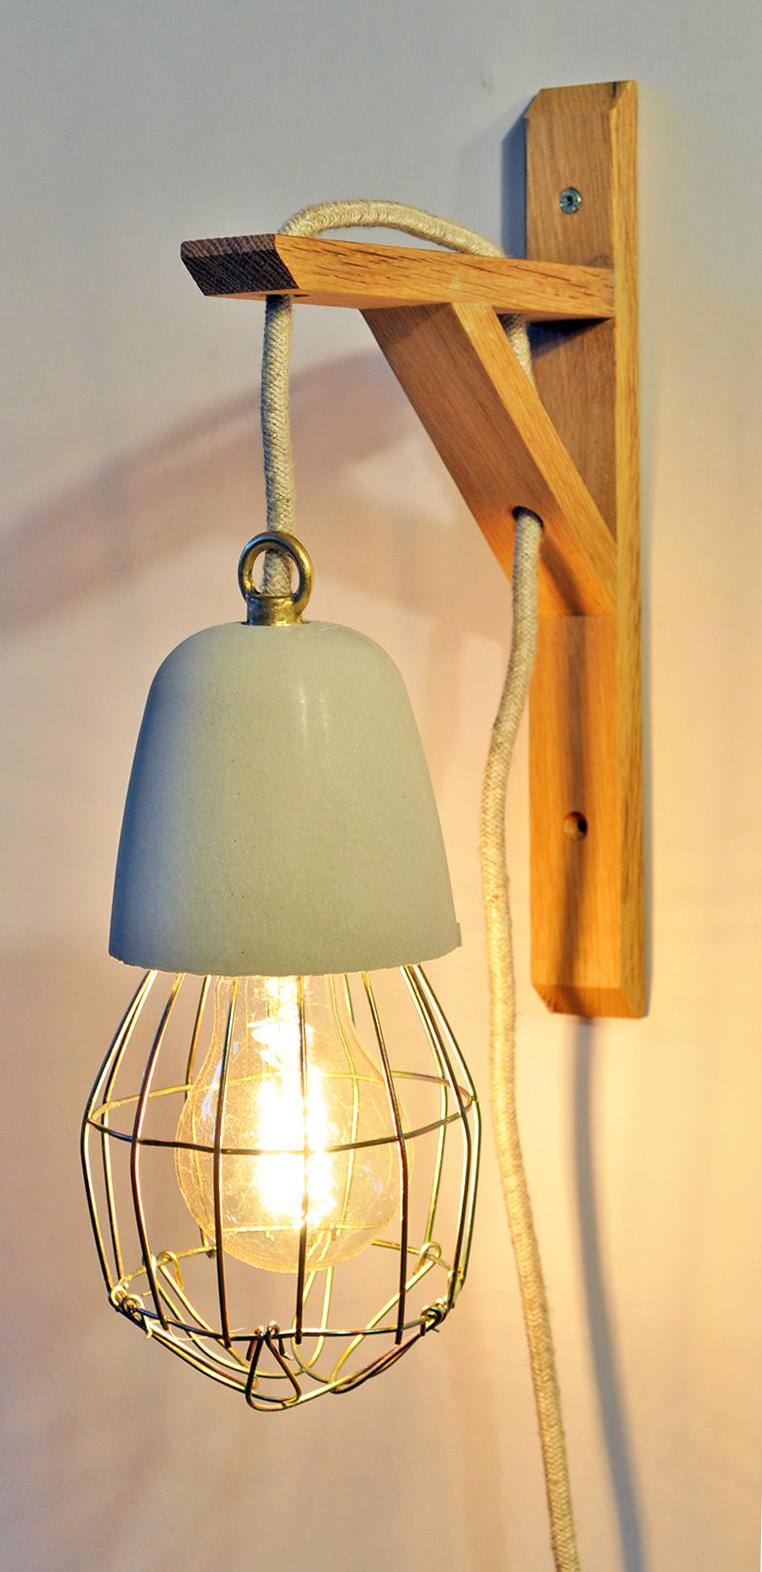 OAK GIBBET #4 Wandampe_ Eiche_ 23cm x 14cm x 5cm_  Edison Vintage Glühbirne 40W_ Rotes Textilkabel_